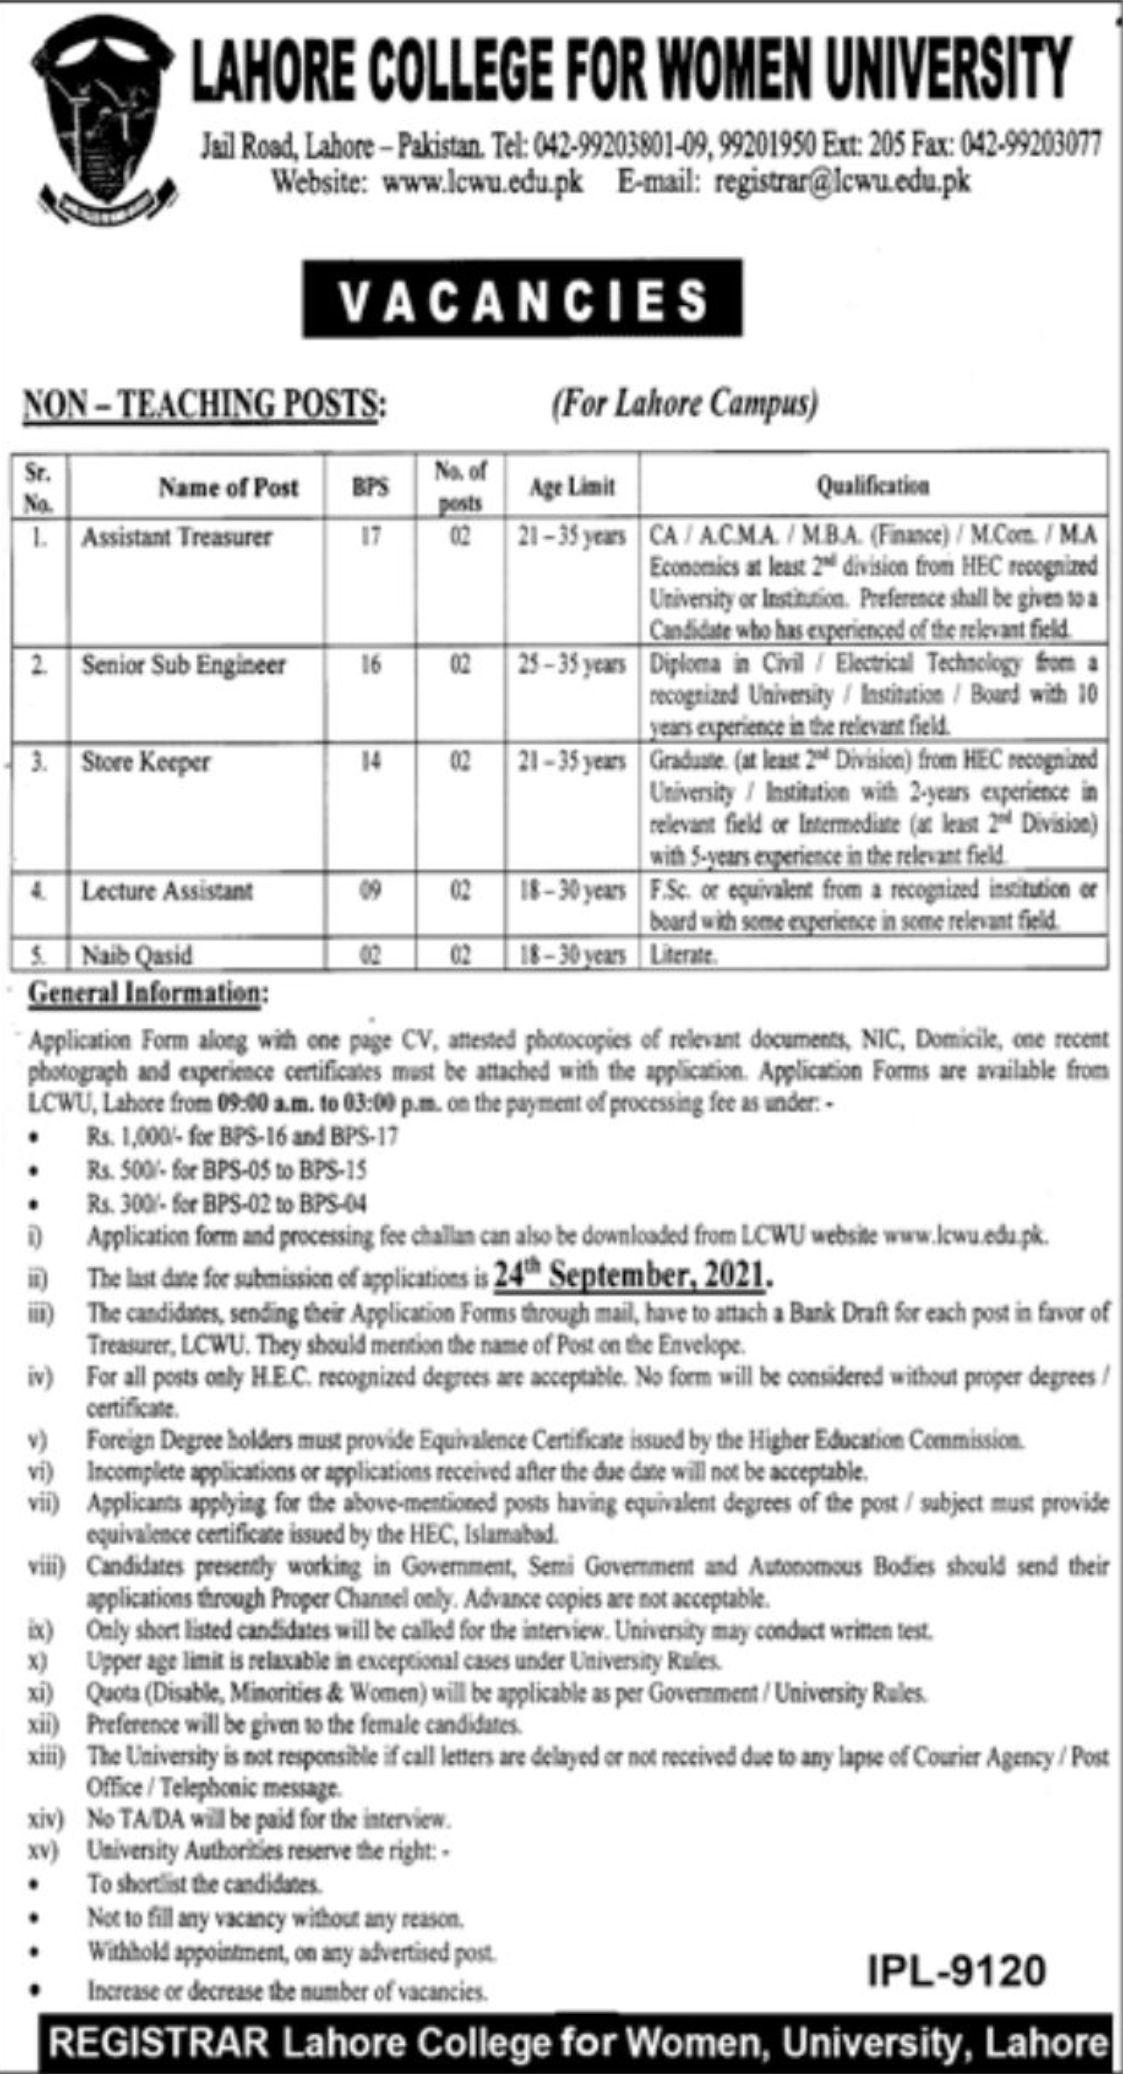 Lahore College for Women University Vacancies 2021 3